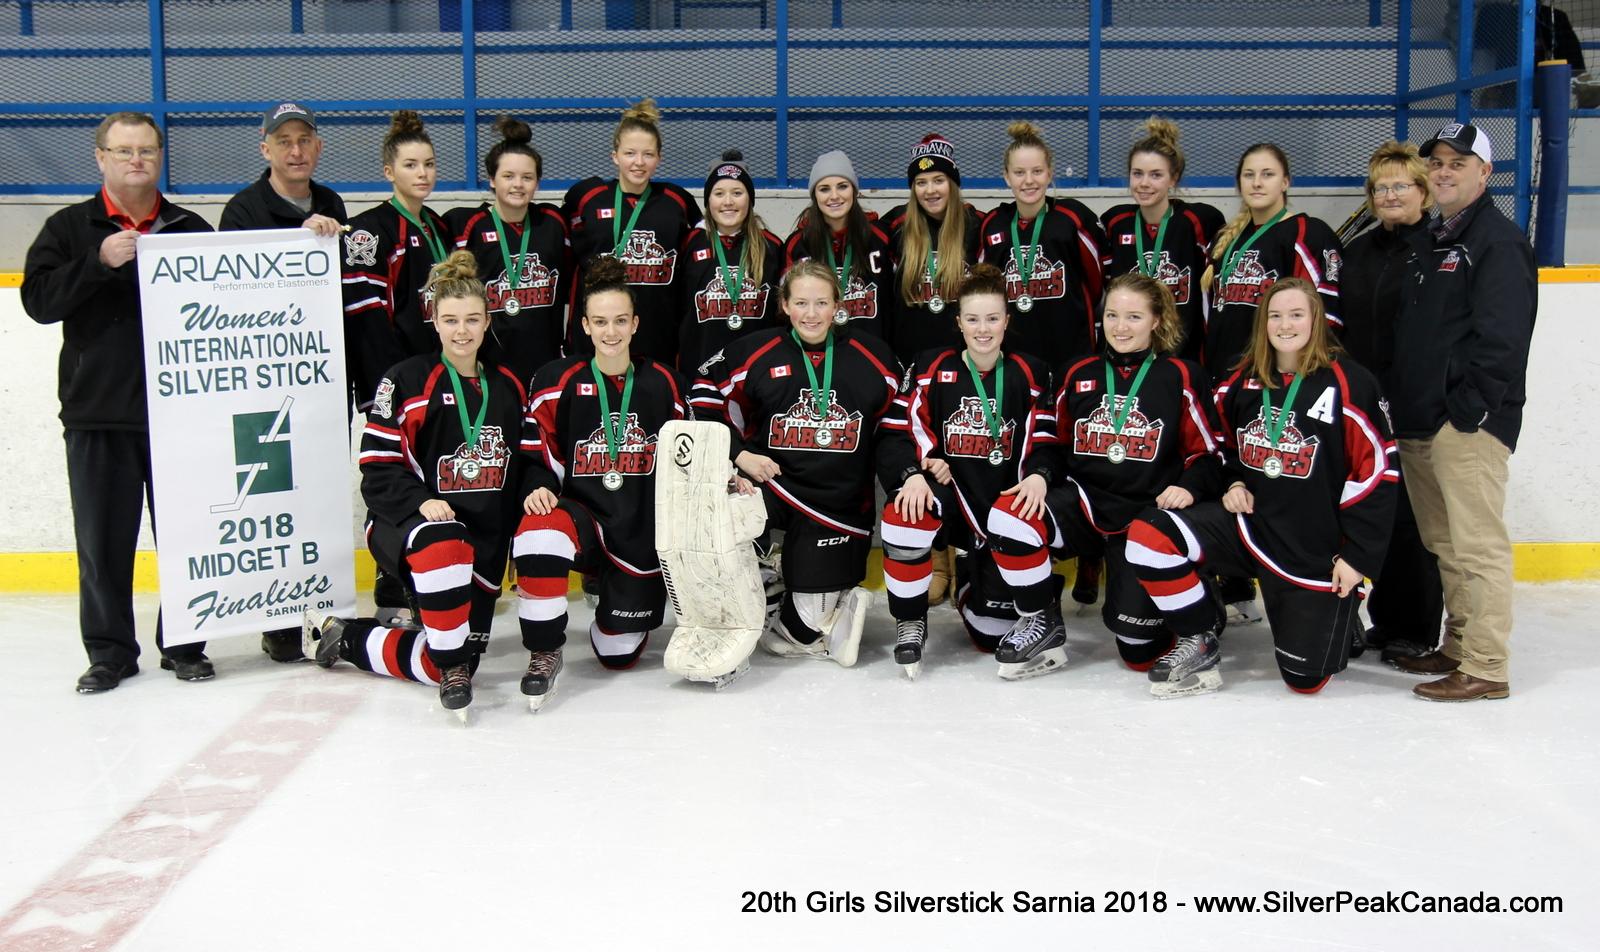 silverpeak studios canada girls silverstick sarnia ontario 2018 (4)